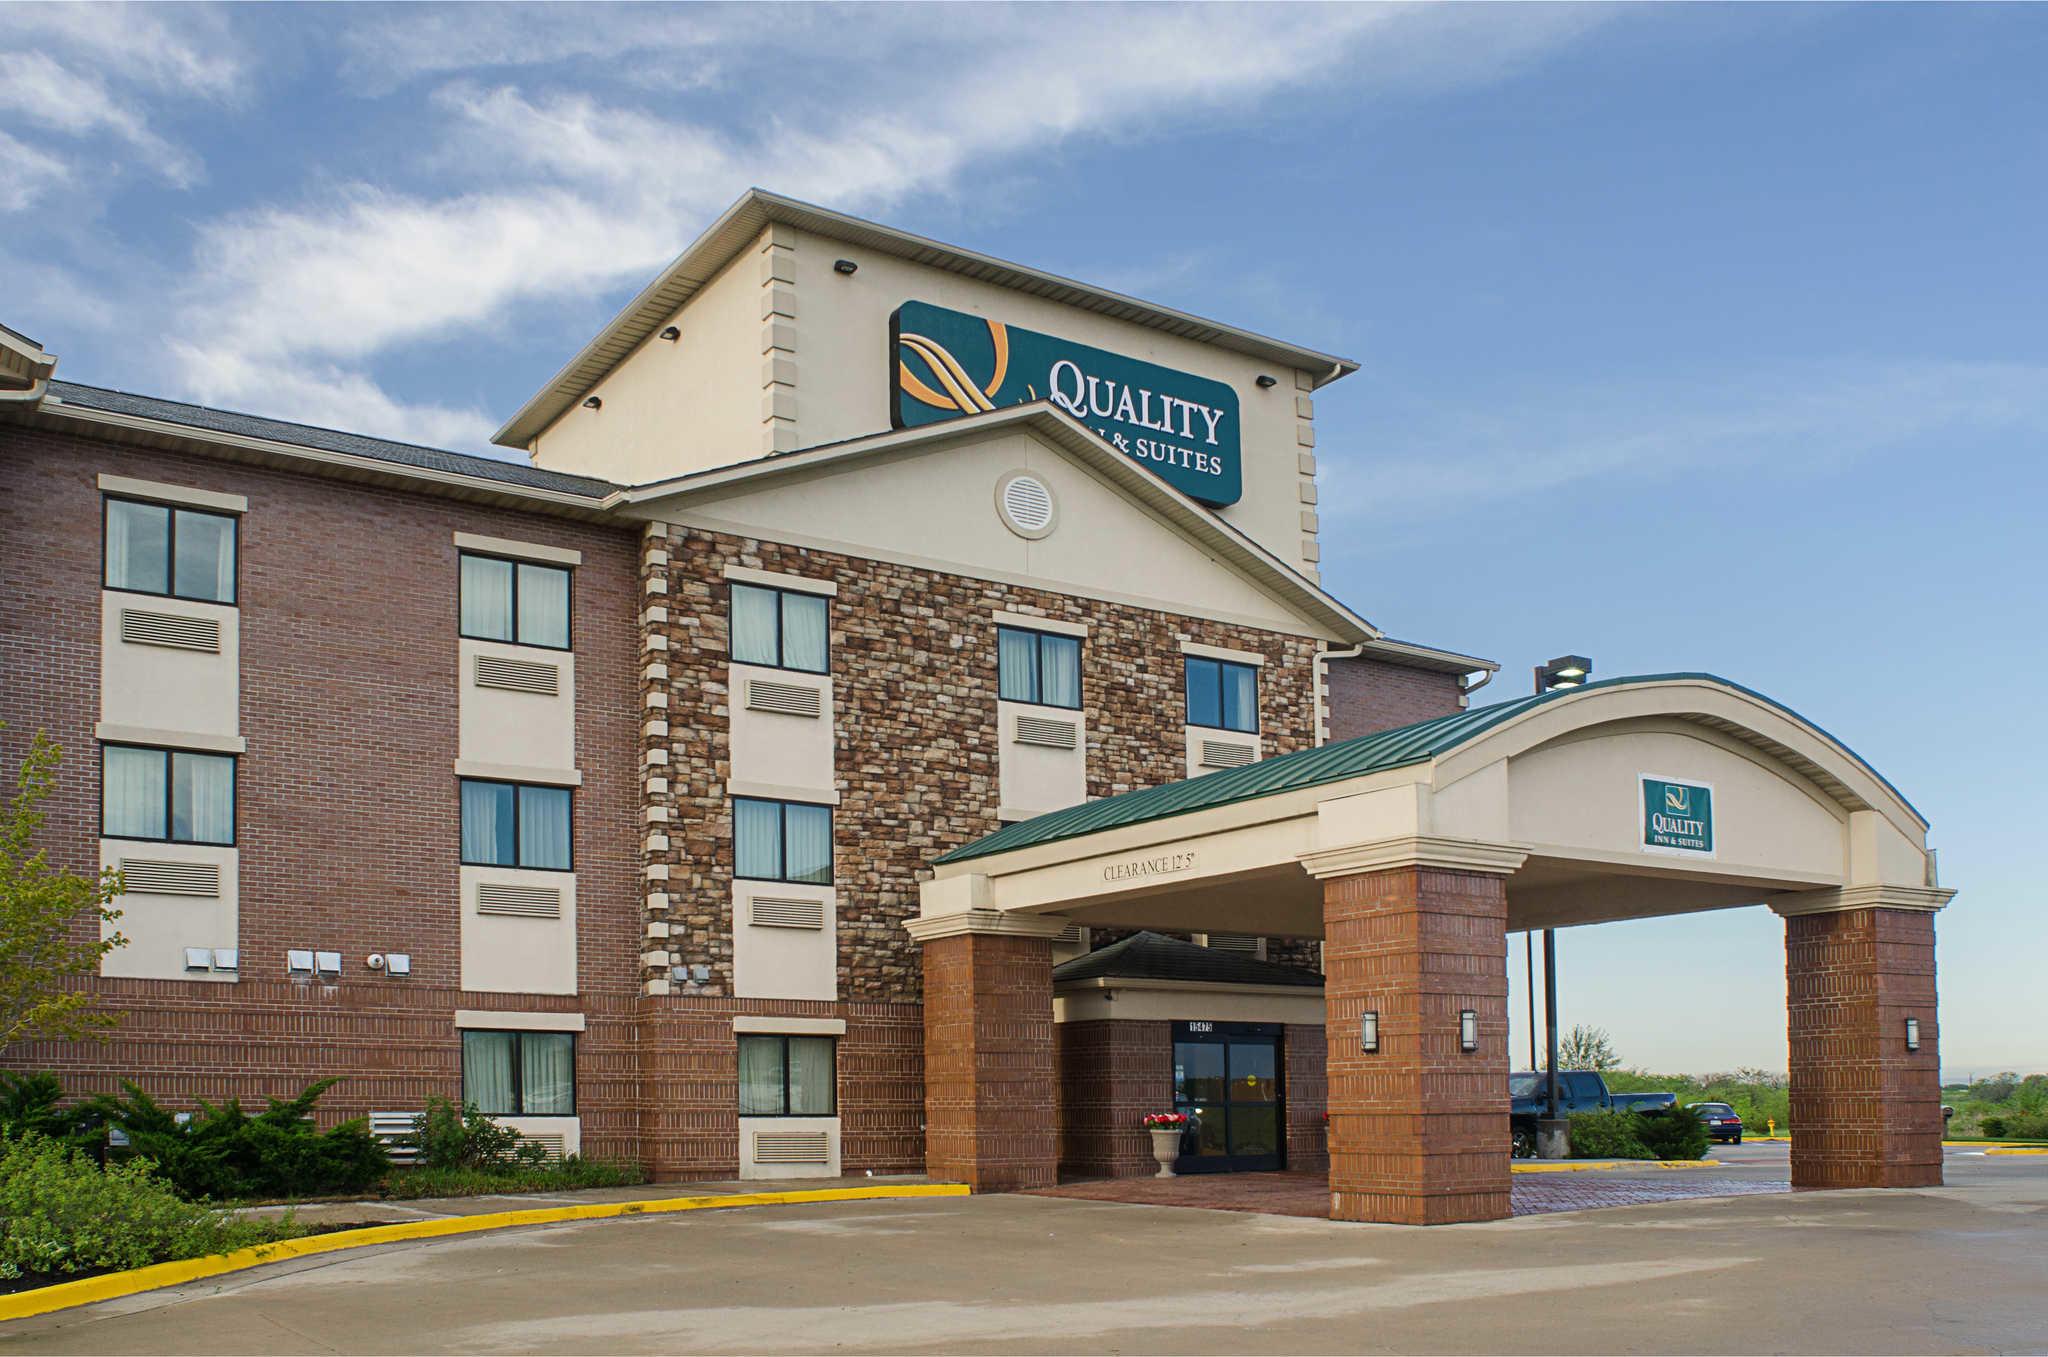 Quality Inn Amp Suites Olathe Kansas City In Olathe Ks